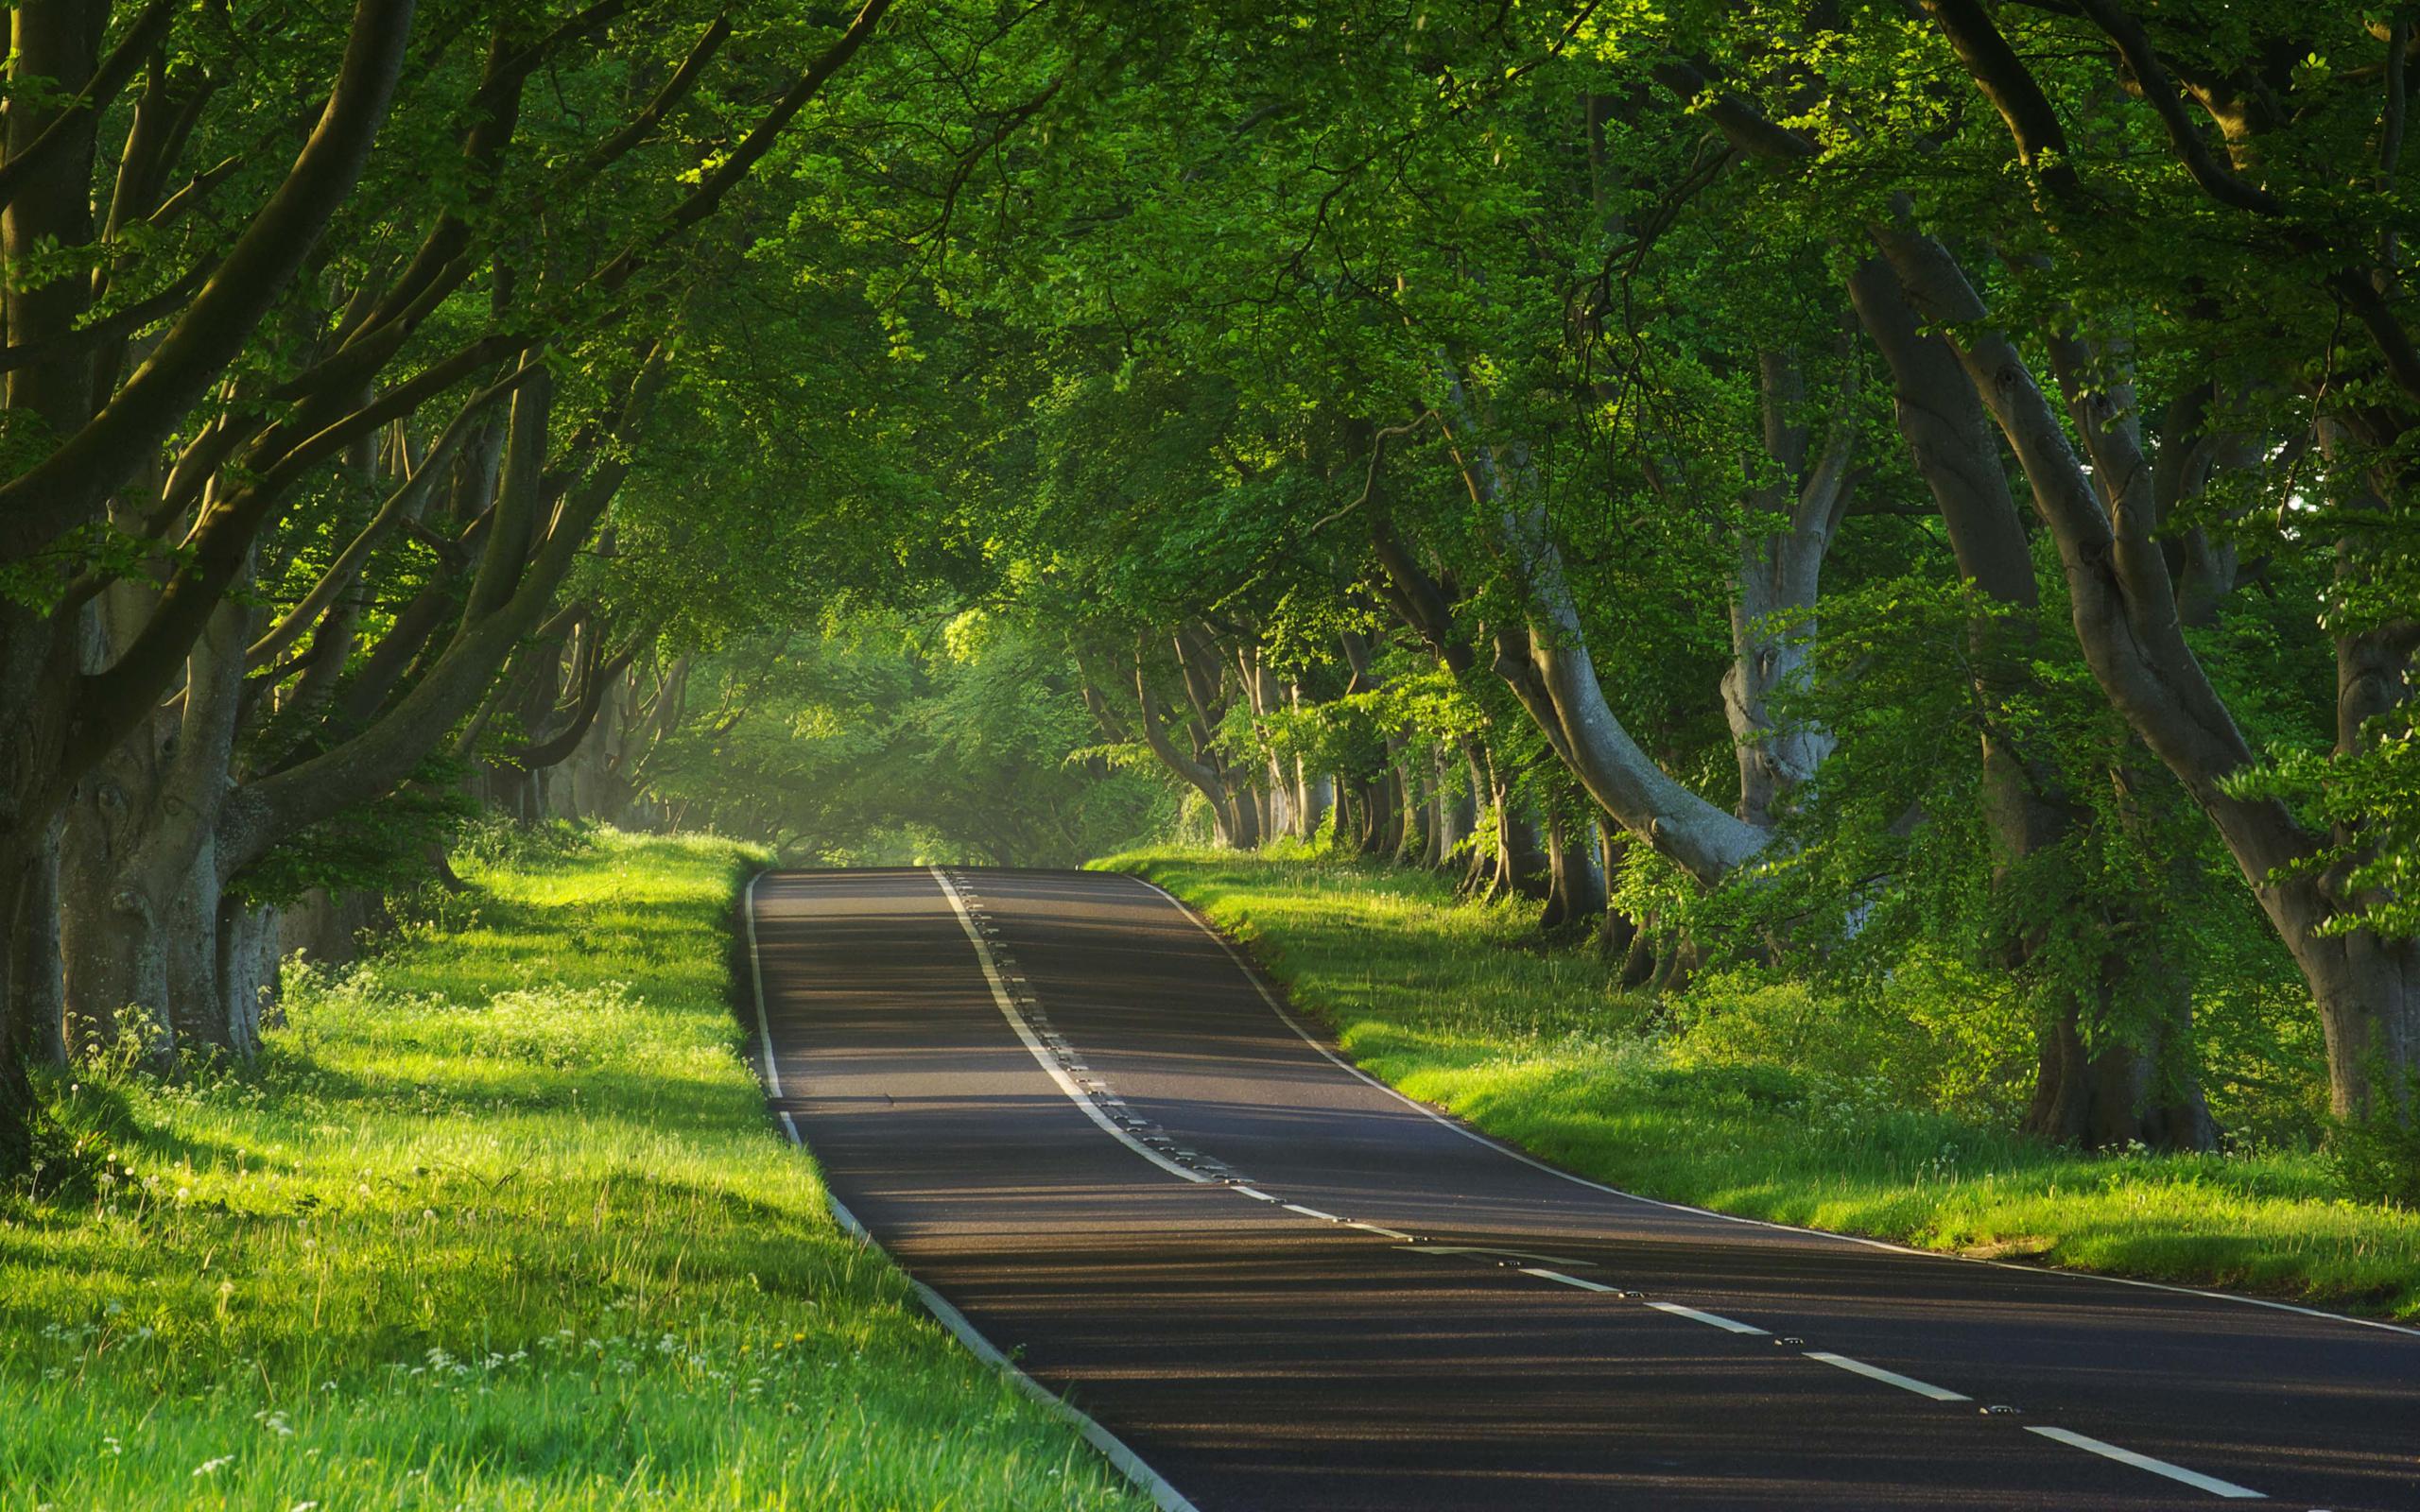 12305 descargar fondo de pantalla Paisaje, Árboles, Carreteras: protectores de pantalla e imágenes gratis